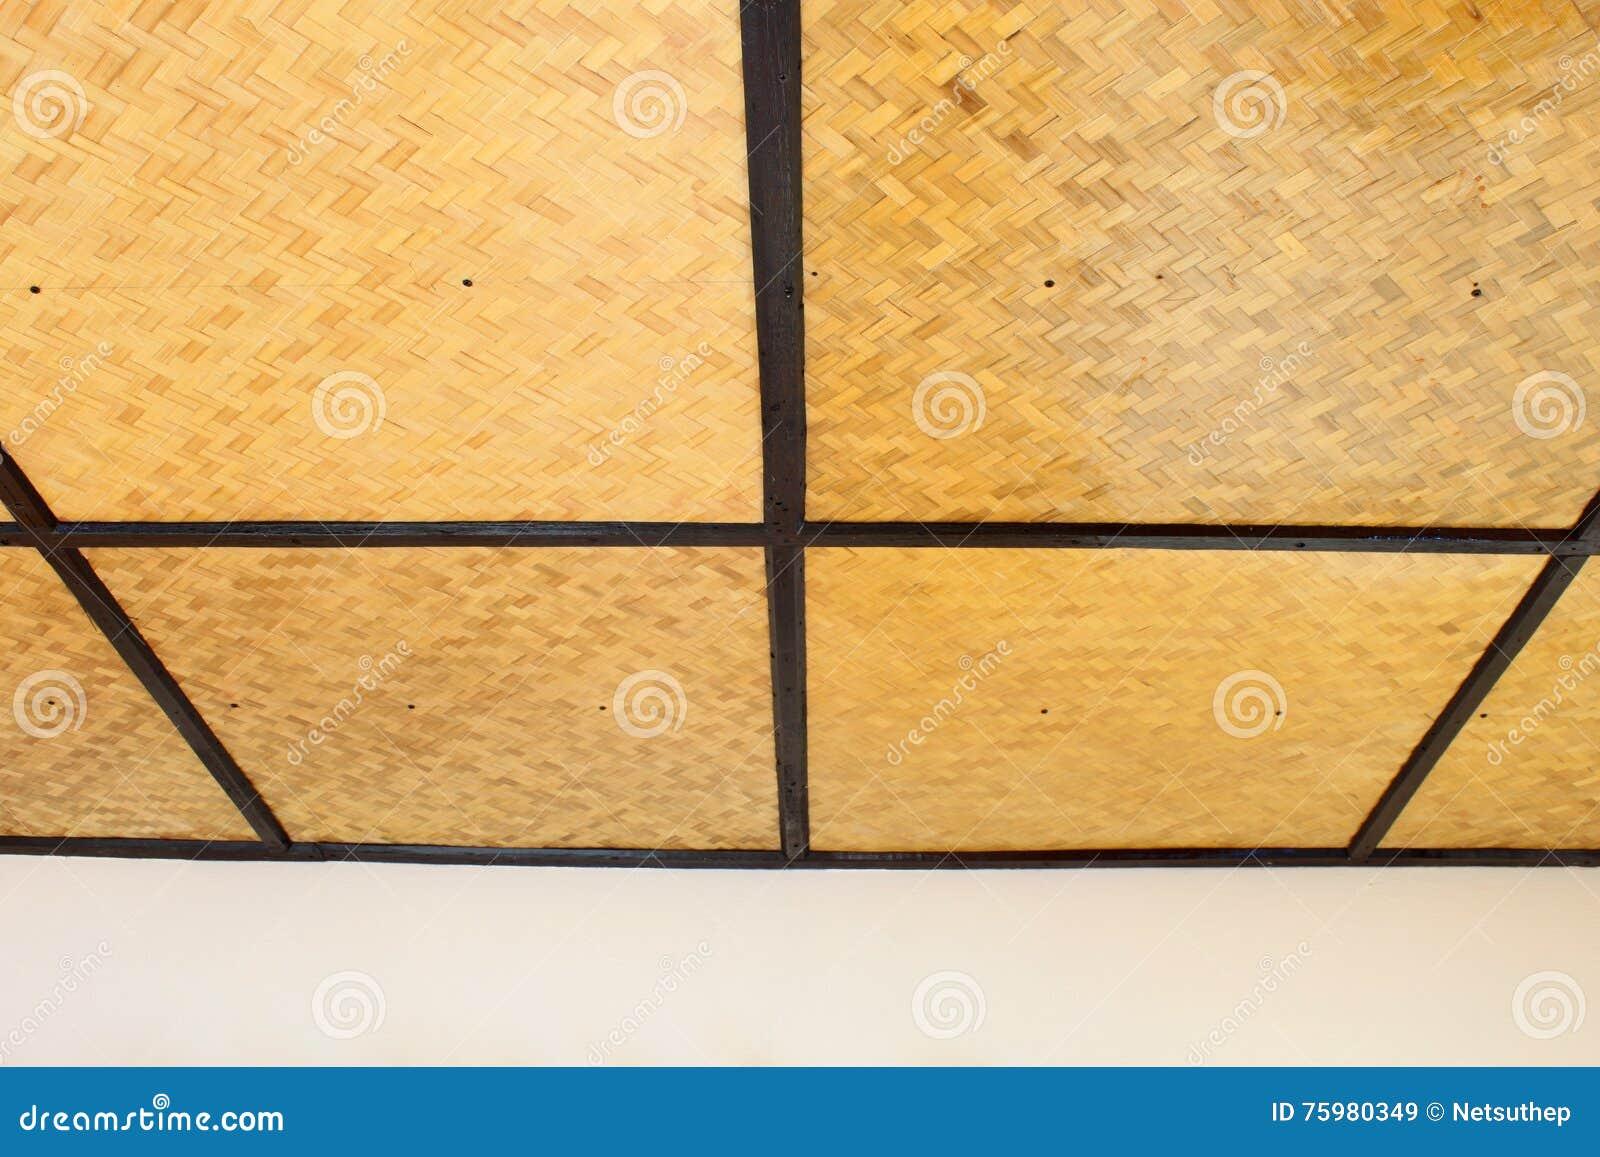 Woven Bamboo Ceiling Stock Image Image Of Hardwood Nature 75980349